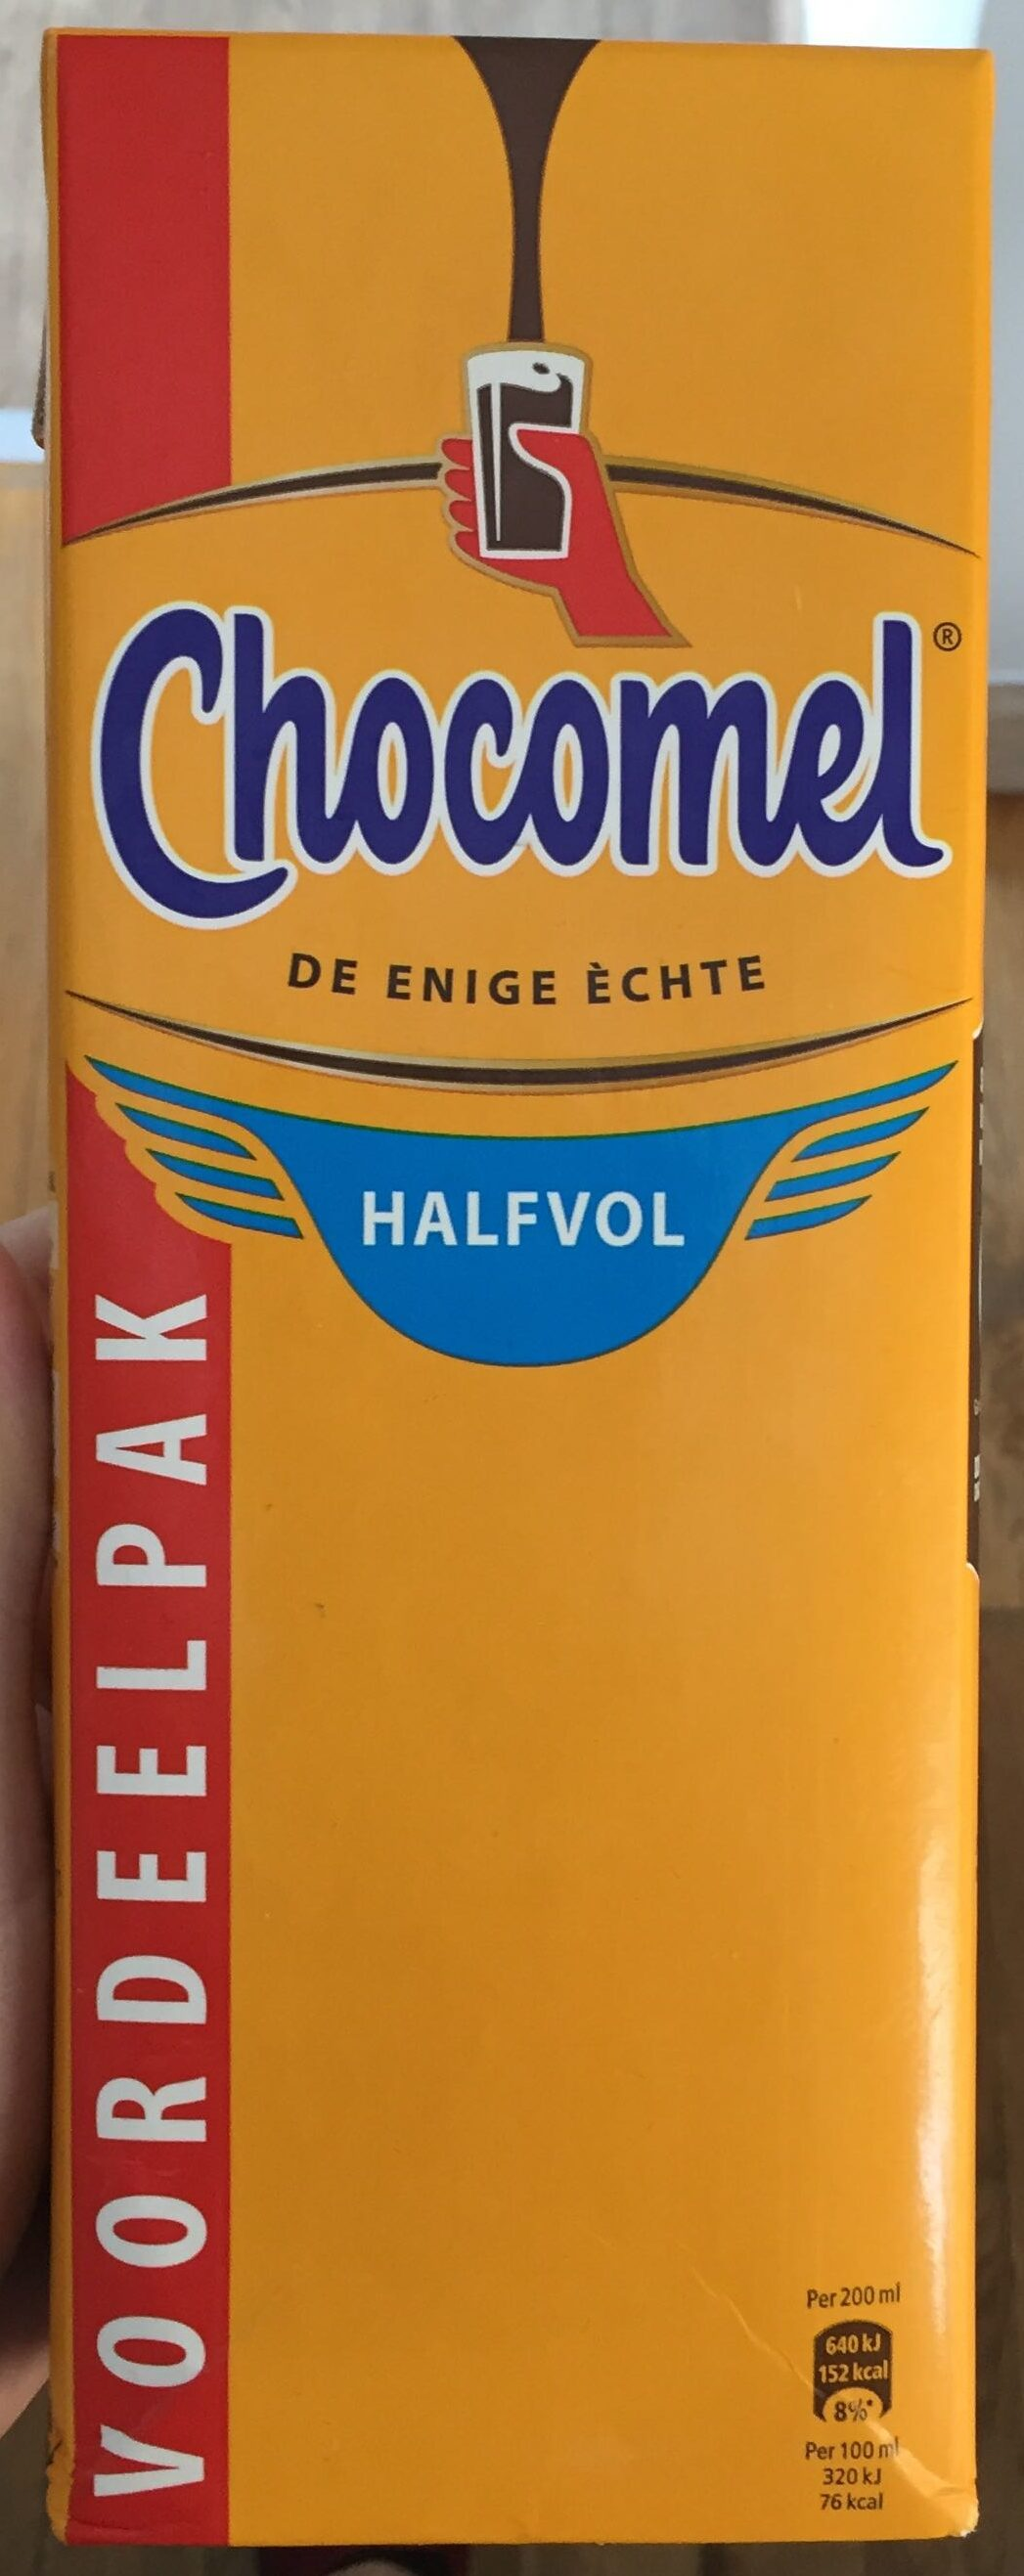 Chocomel halvol - Product - nl